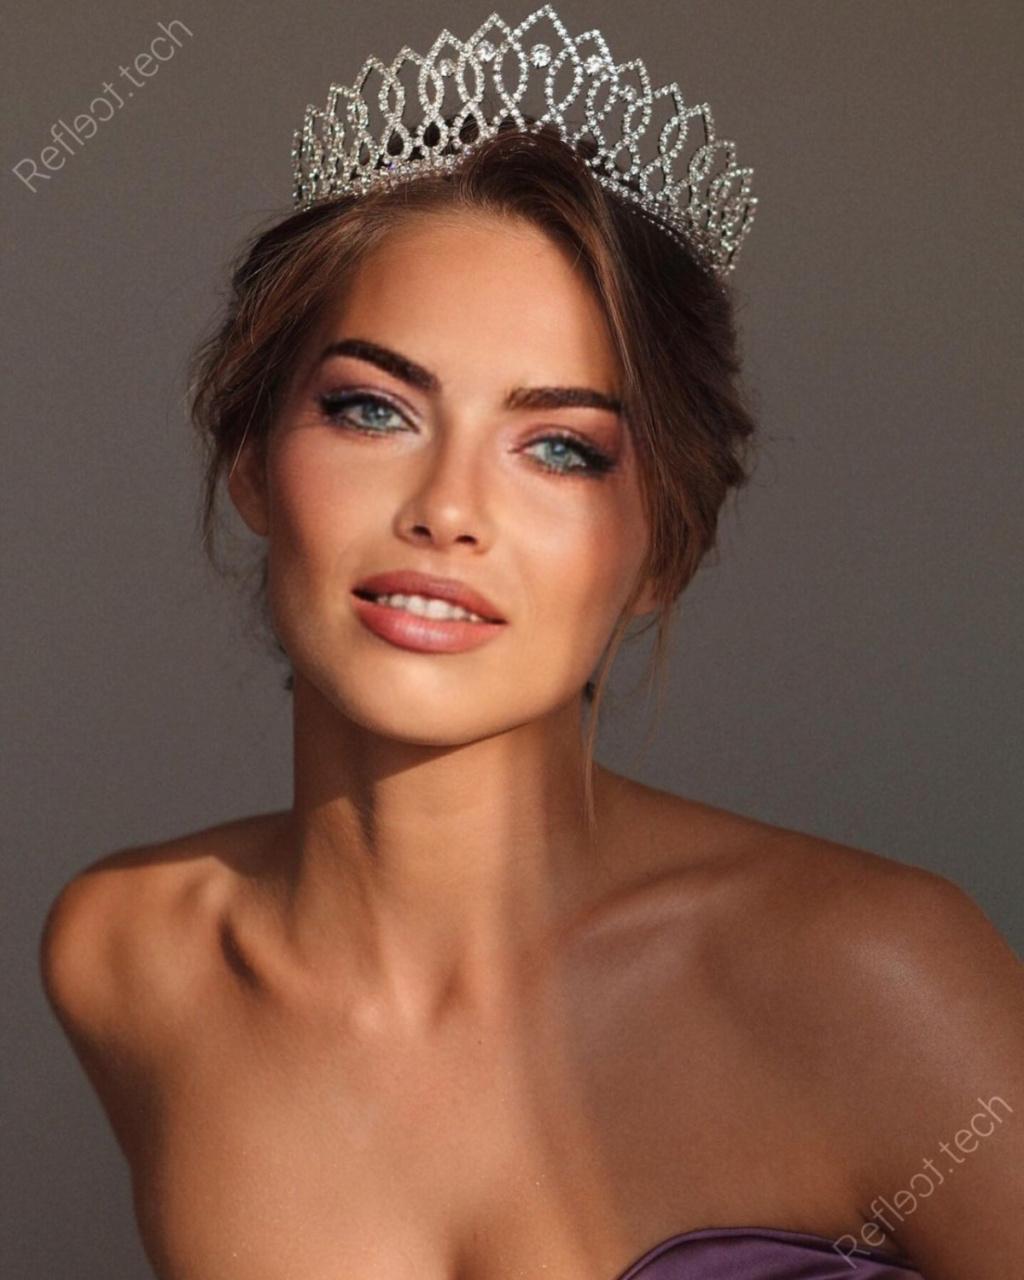 Miss GC 2021-candidatures des miss - Page 2 Reflec10